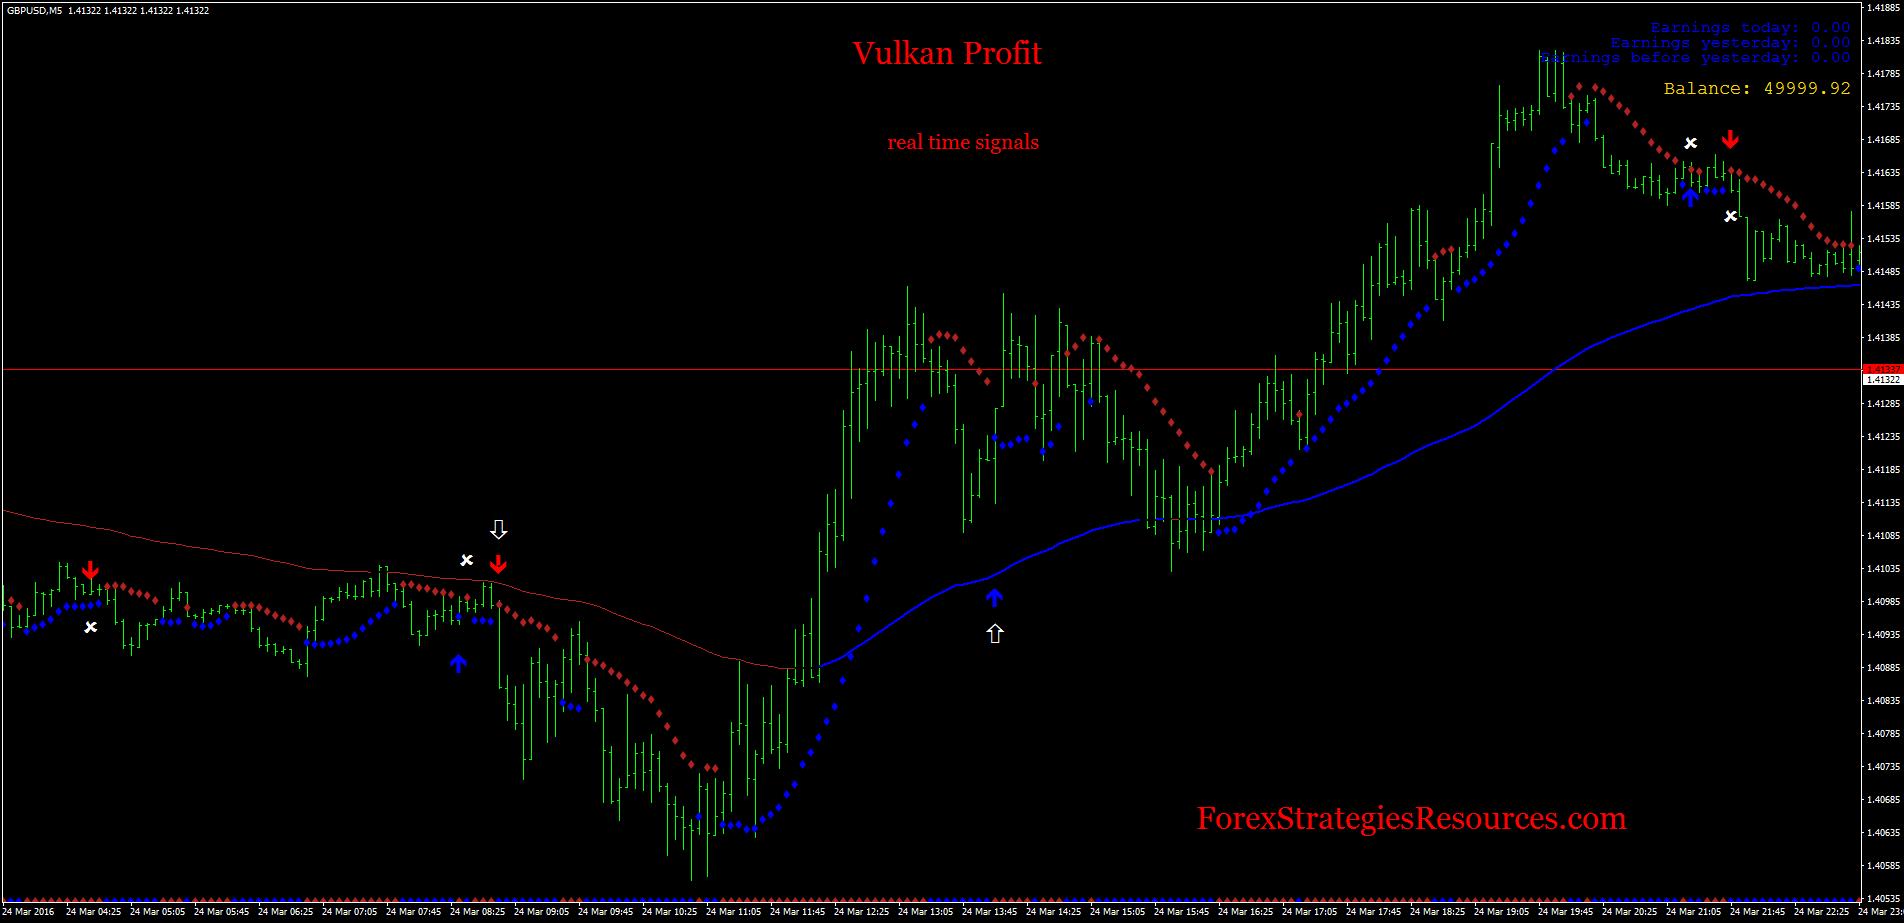 Vulkan Profit Indicator - Forex Strategies - Forex Resources